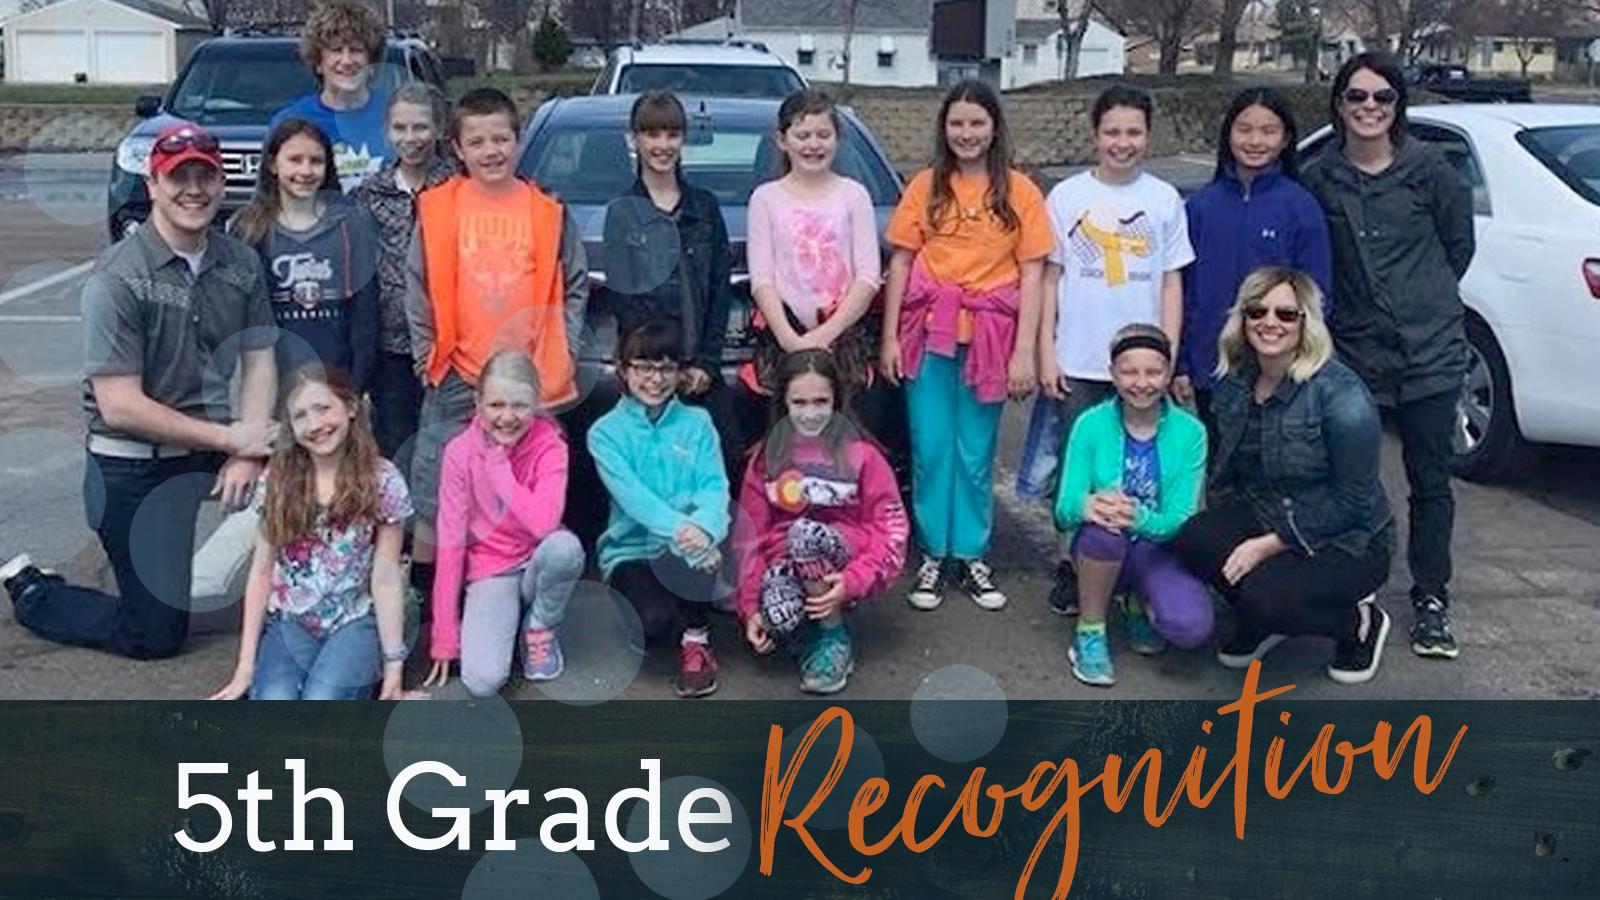 5thgraderecognition